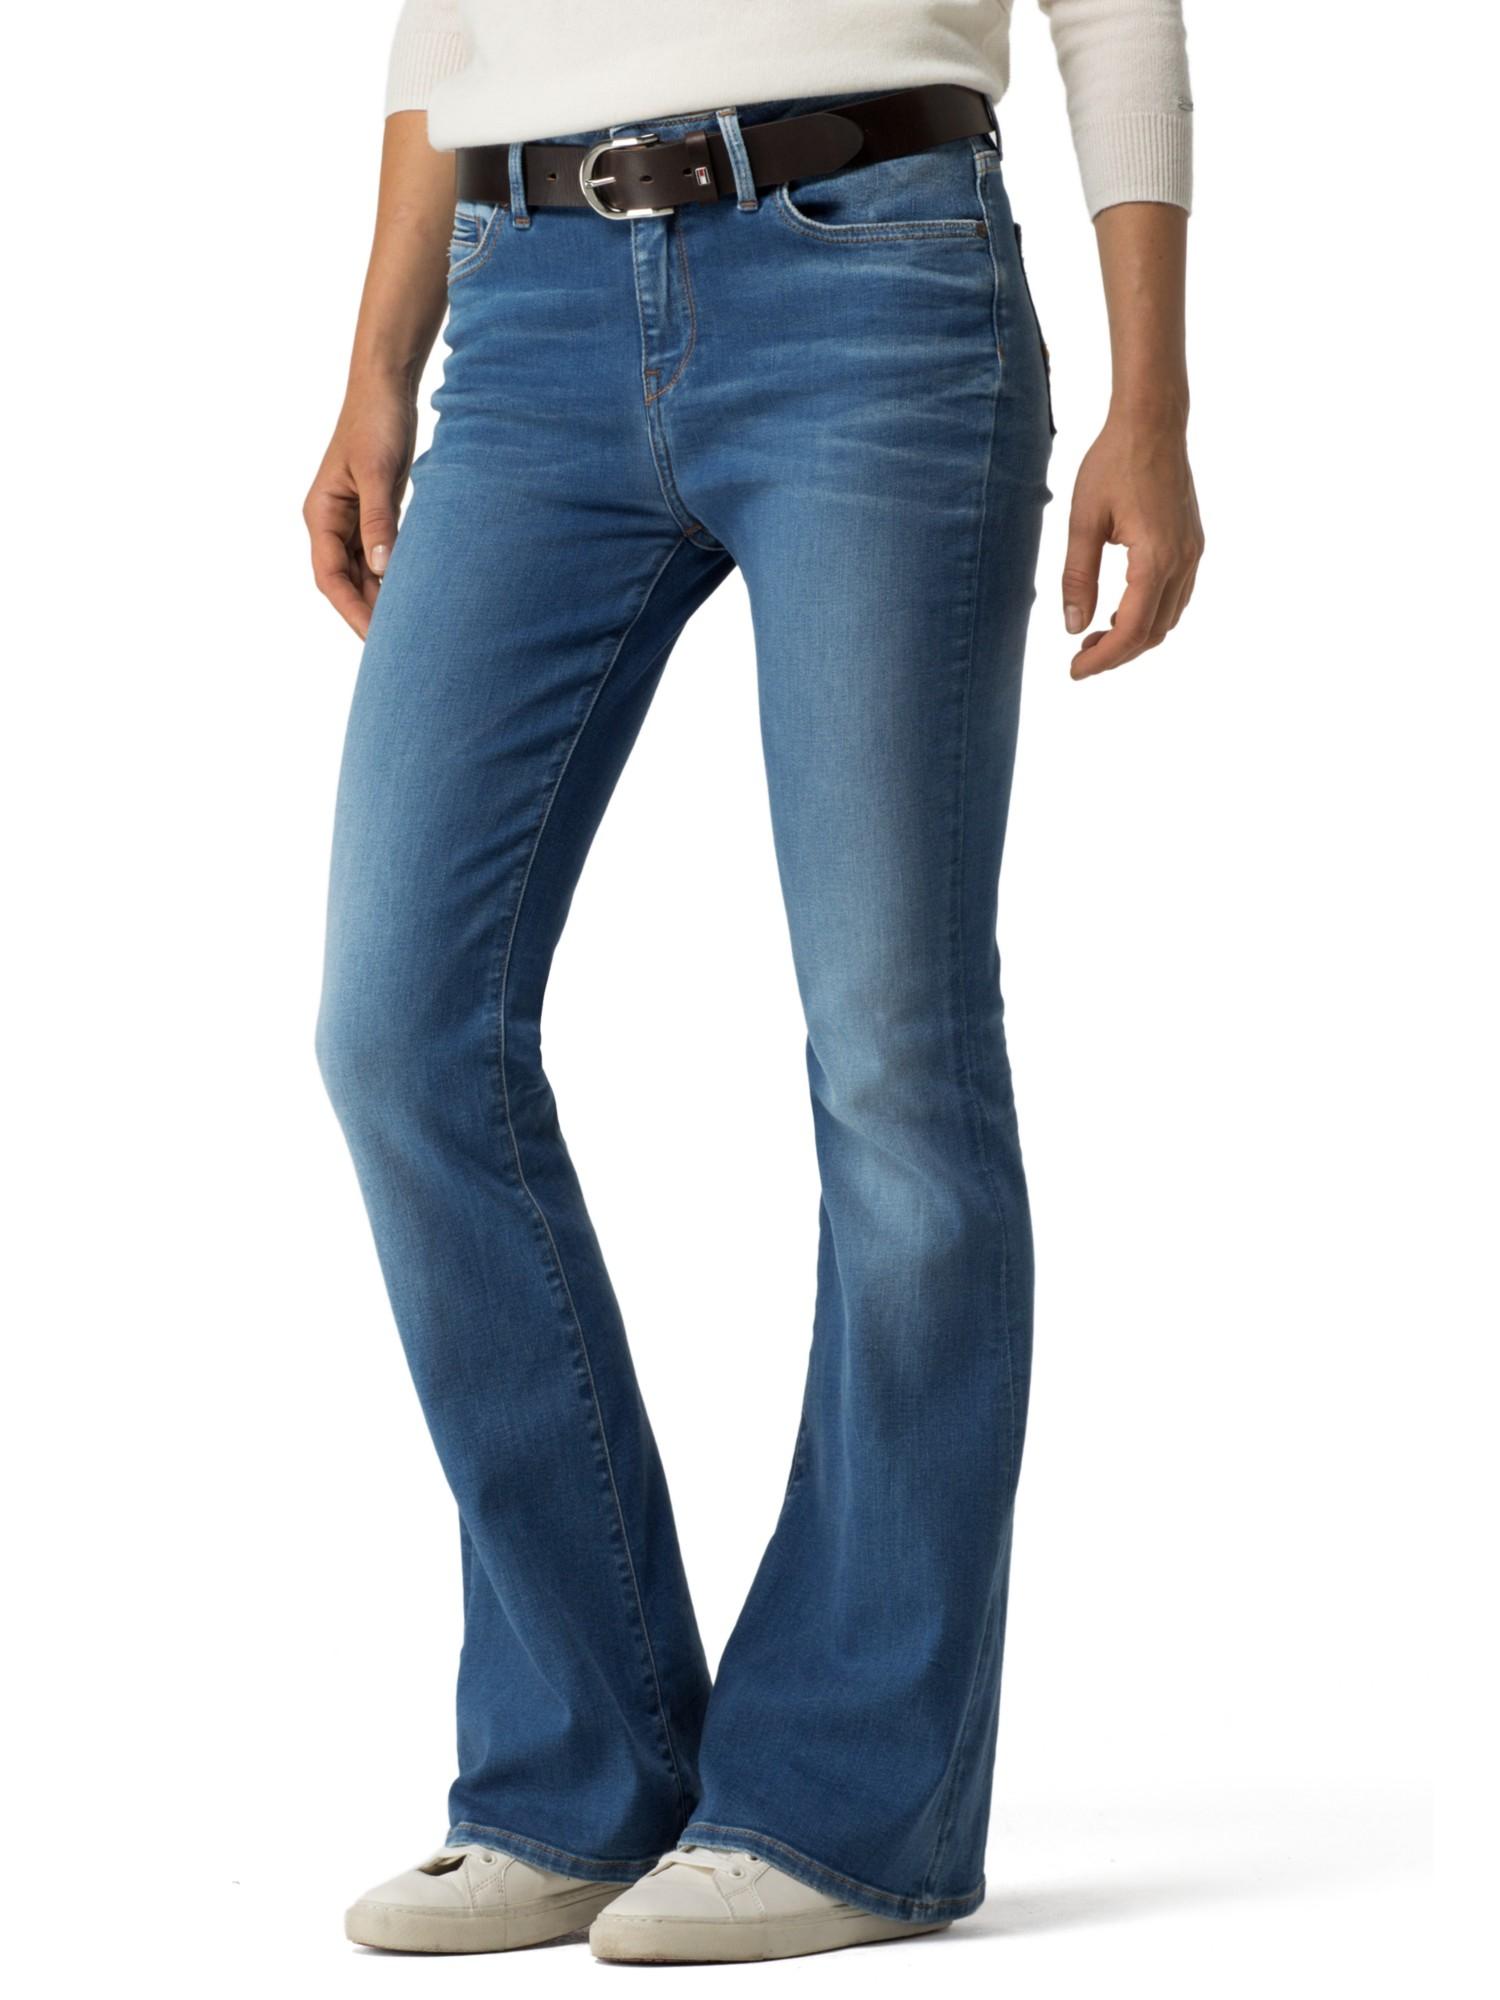 tommy hilfiger paris bootcut jeans in blue lyst. Black Bedroom Furniture Sets. Home Design Ideas